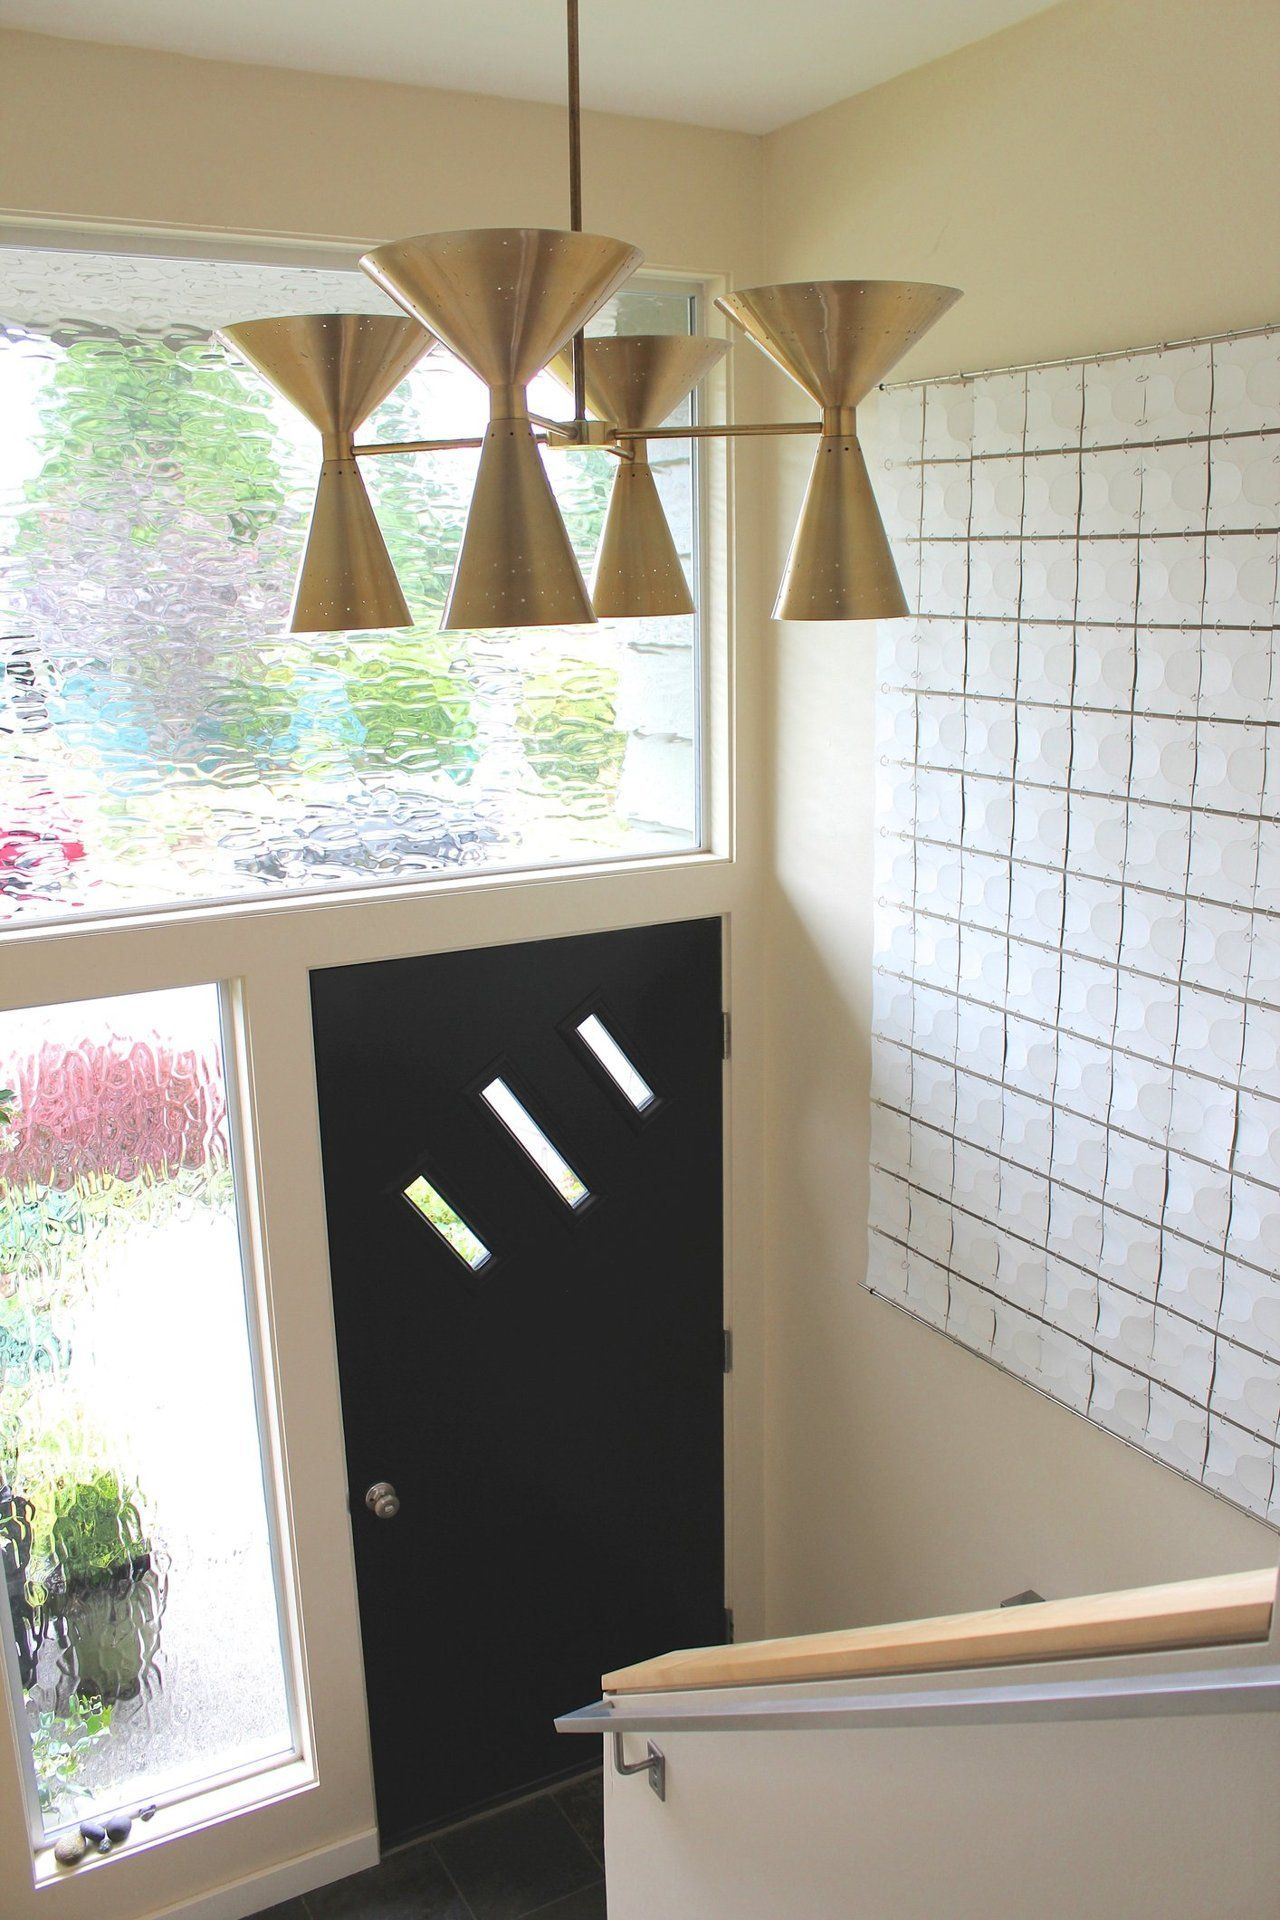 Entryway window ideas  susan u herbus handmade midcentury split level  mid century